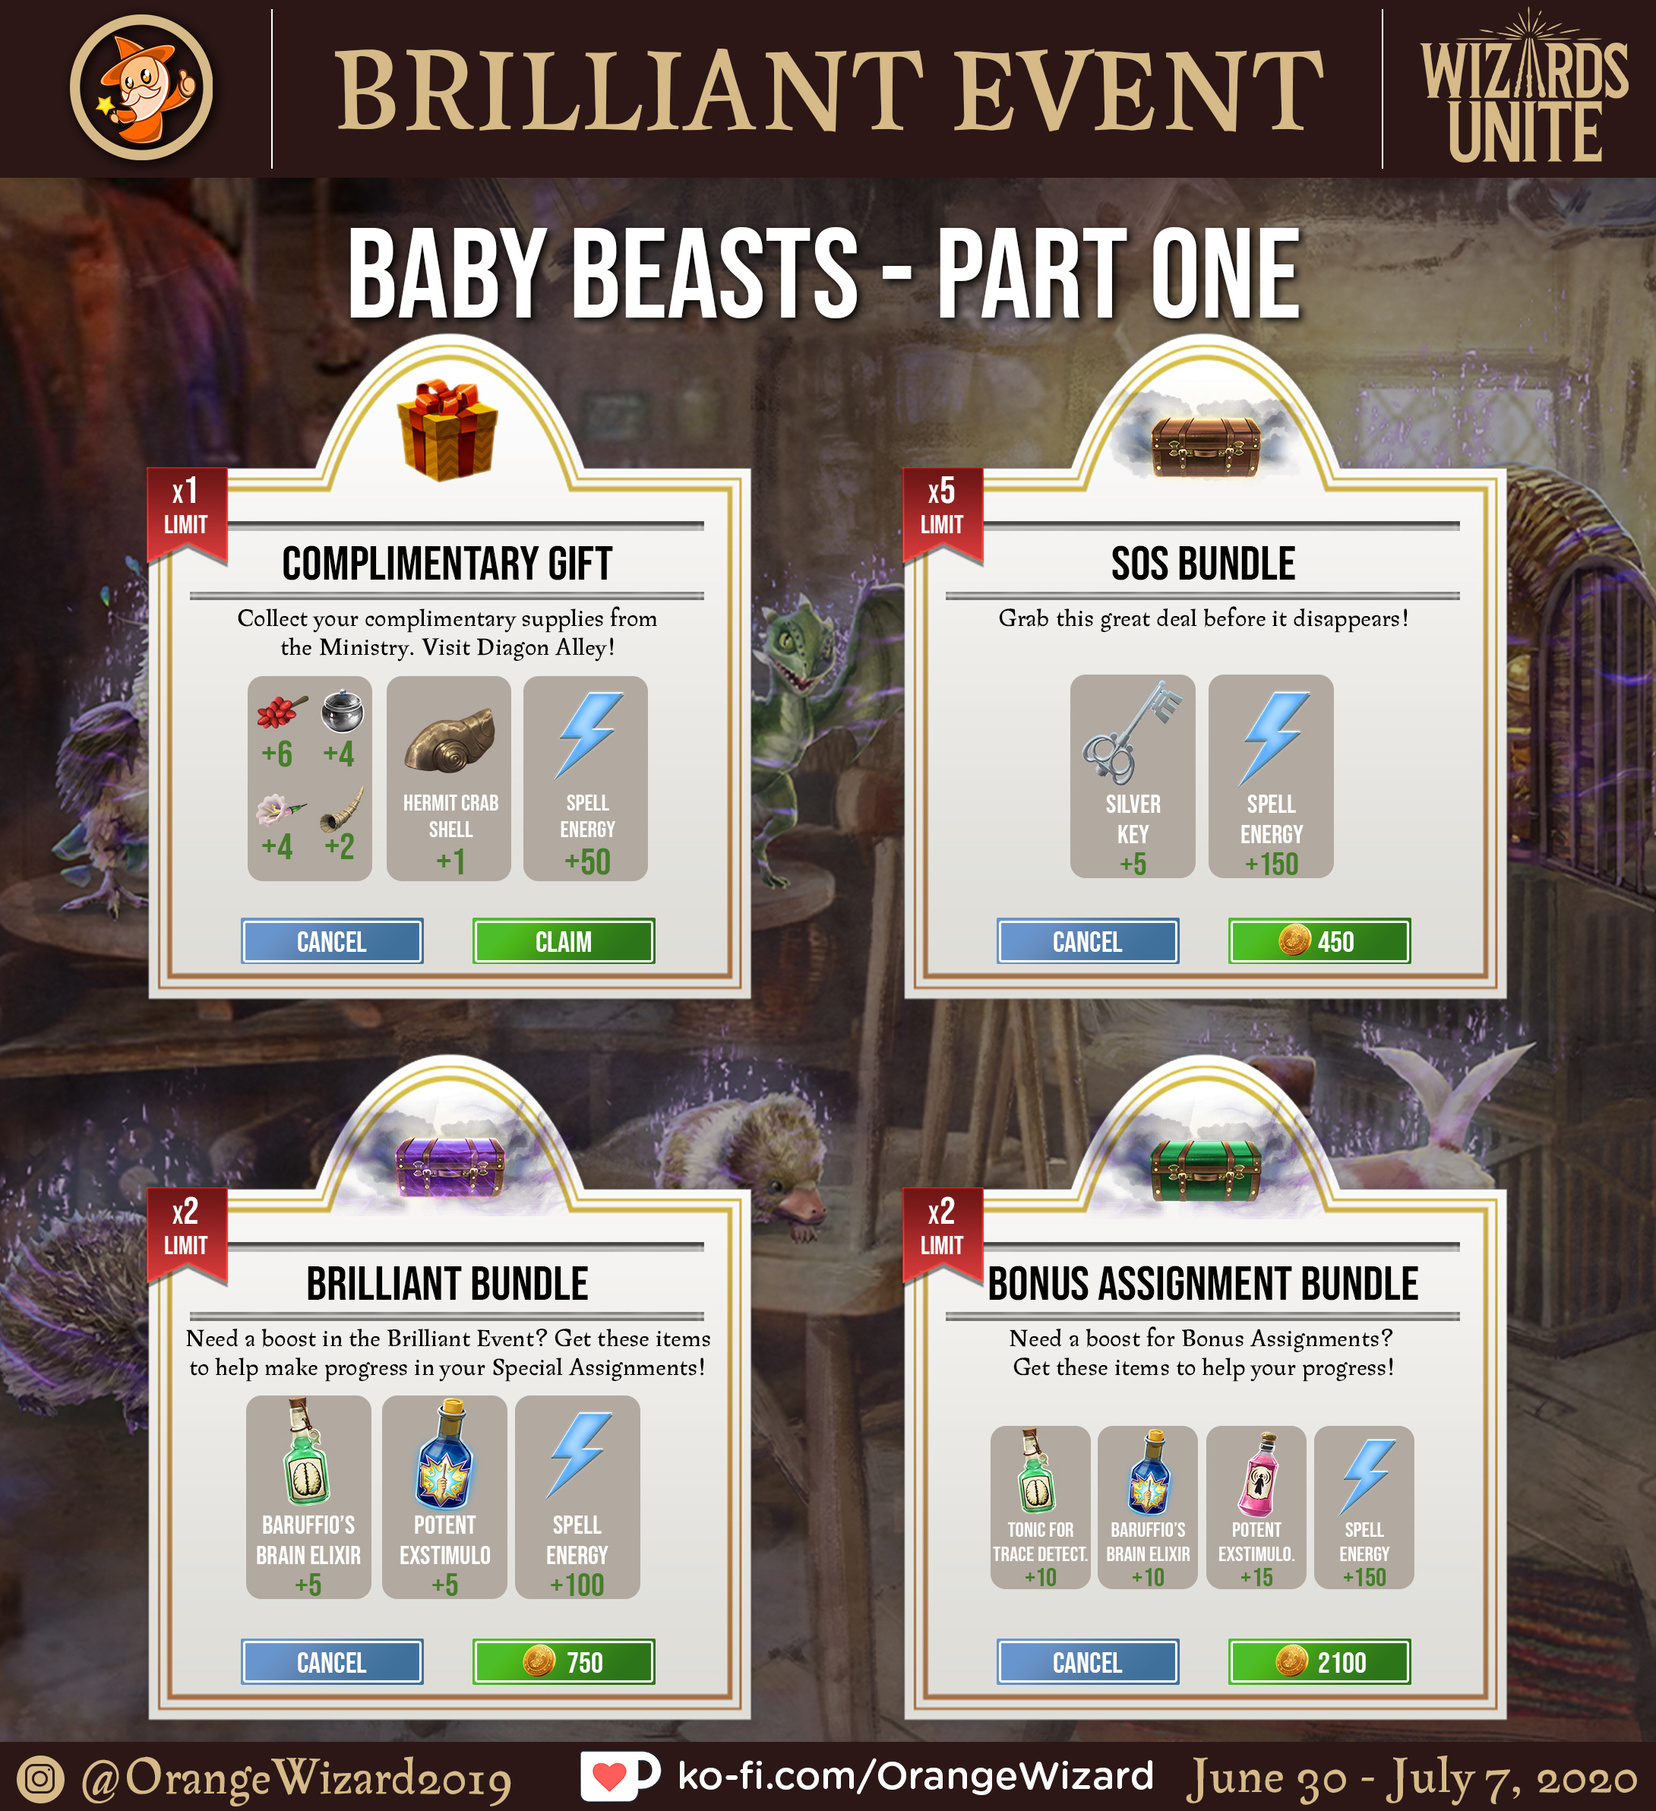 BRILLIANT_EVENT_-_BABY_BEASTS_I_-_GIFT__BUNDLES.jpg